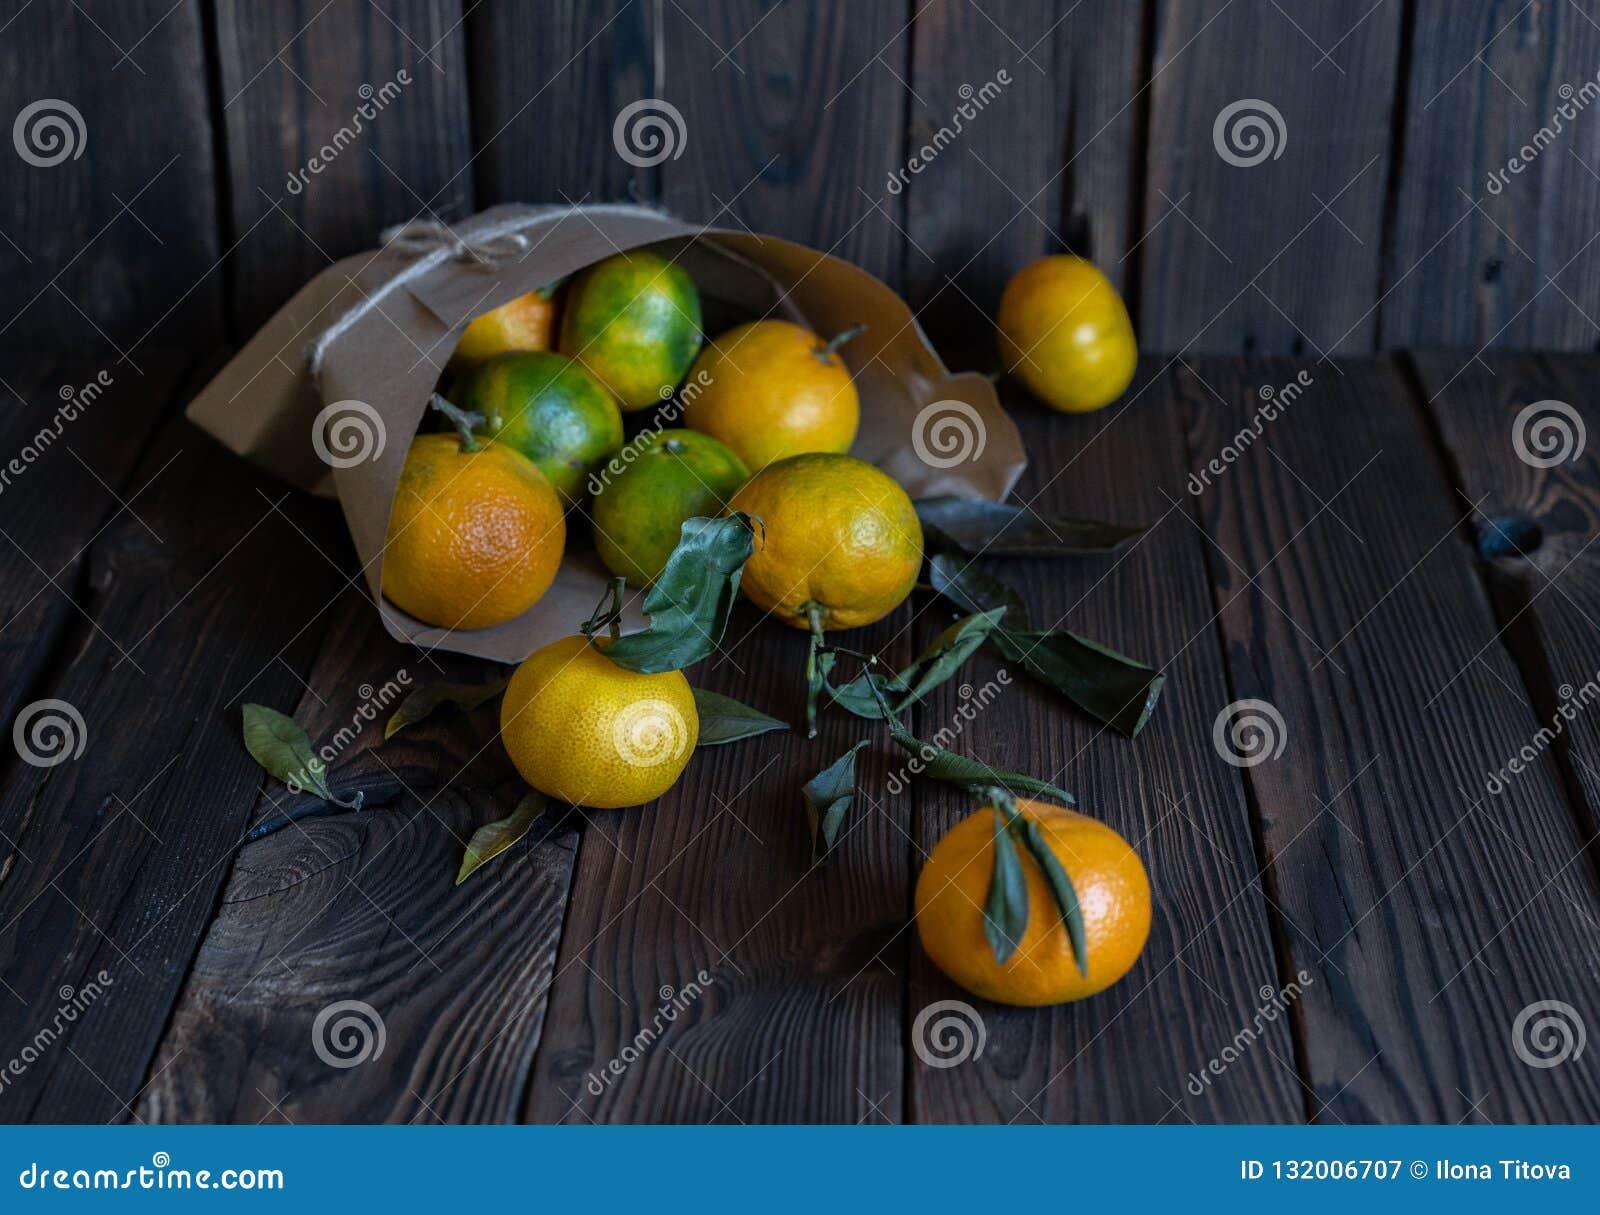 Mandarijnensinaasappelen, mandarins, clementines, citrusvruchten